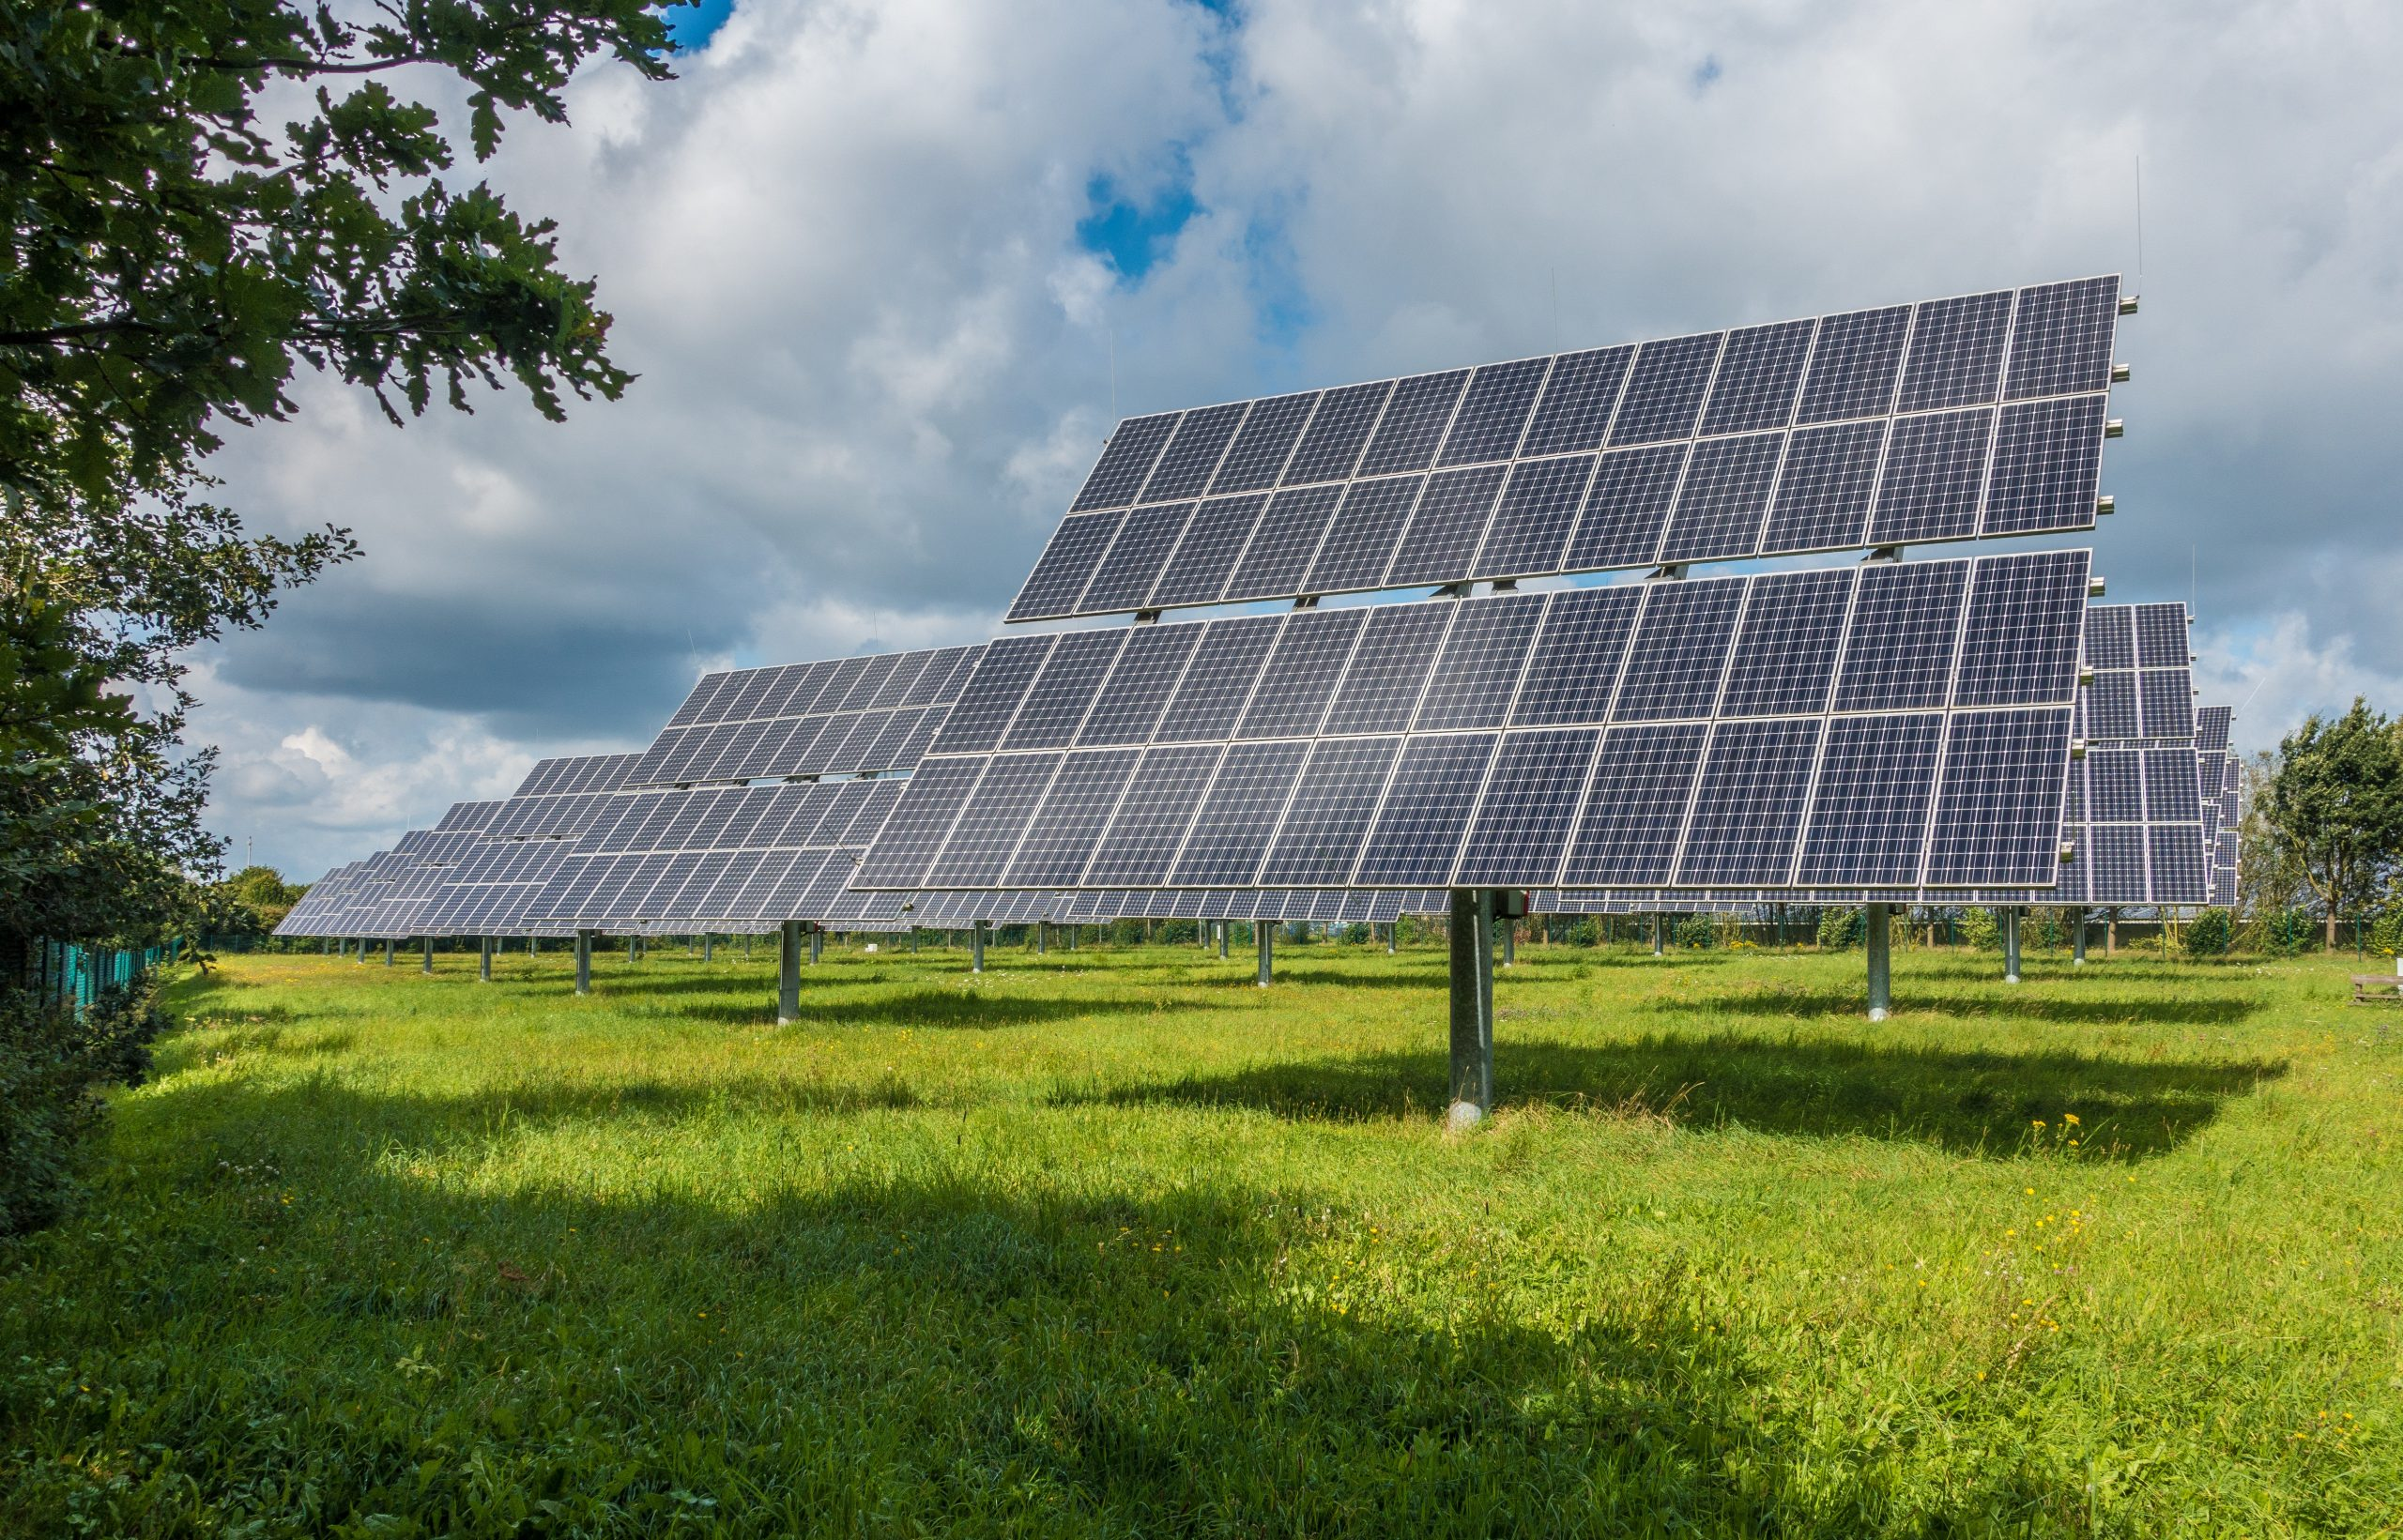 AleaSoft - solar panel array